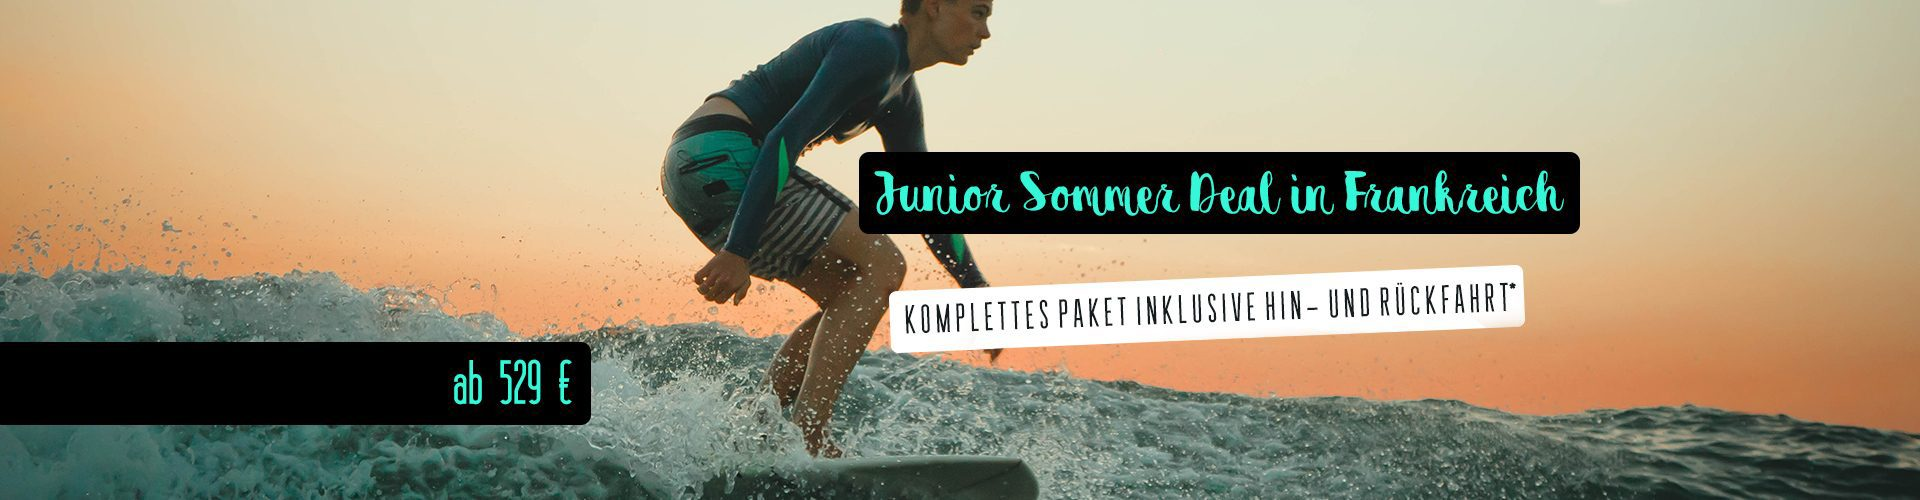 Junior Camps France